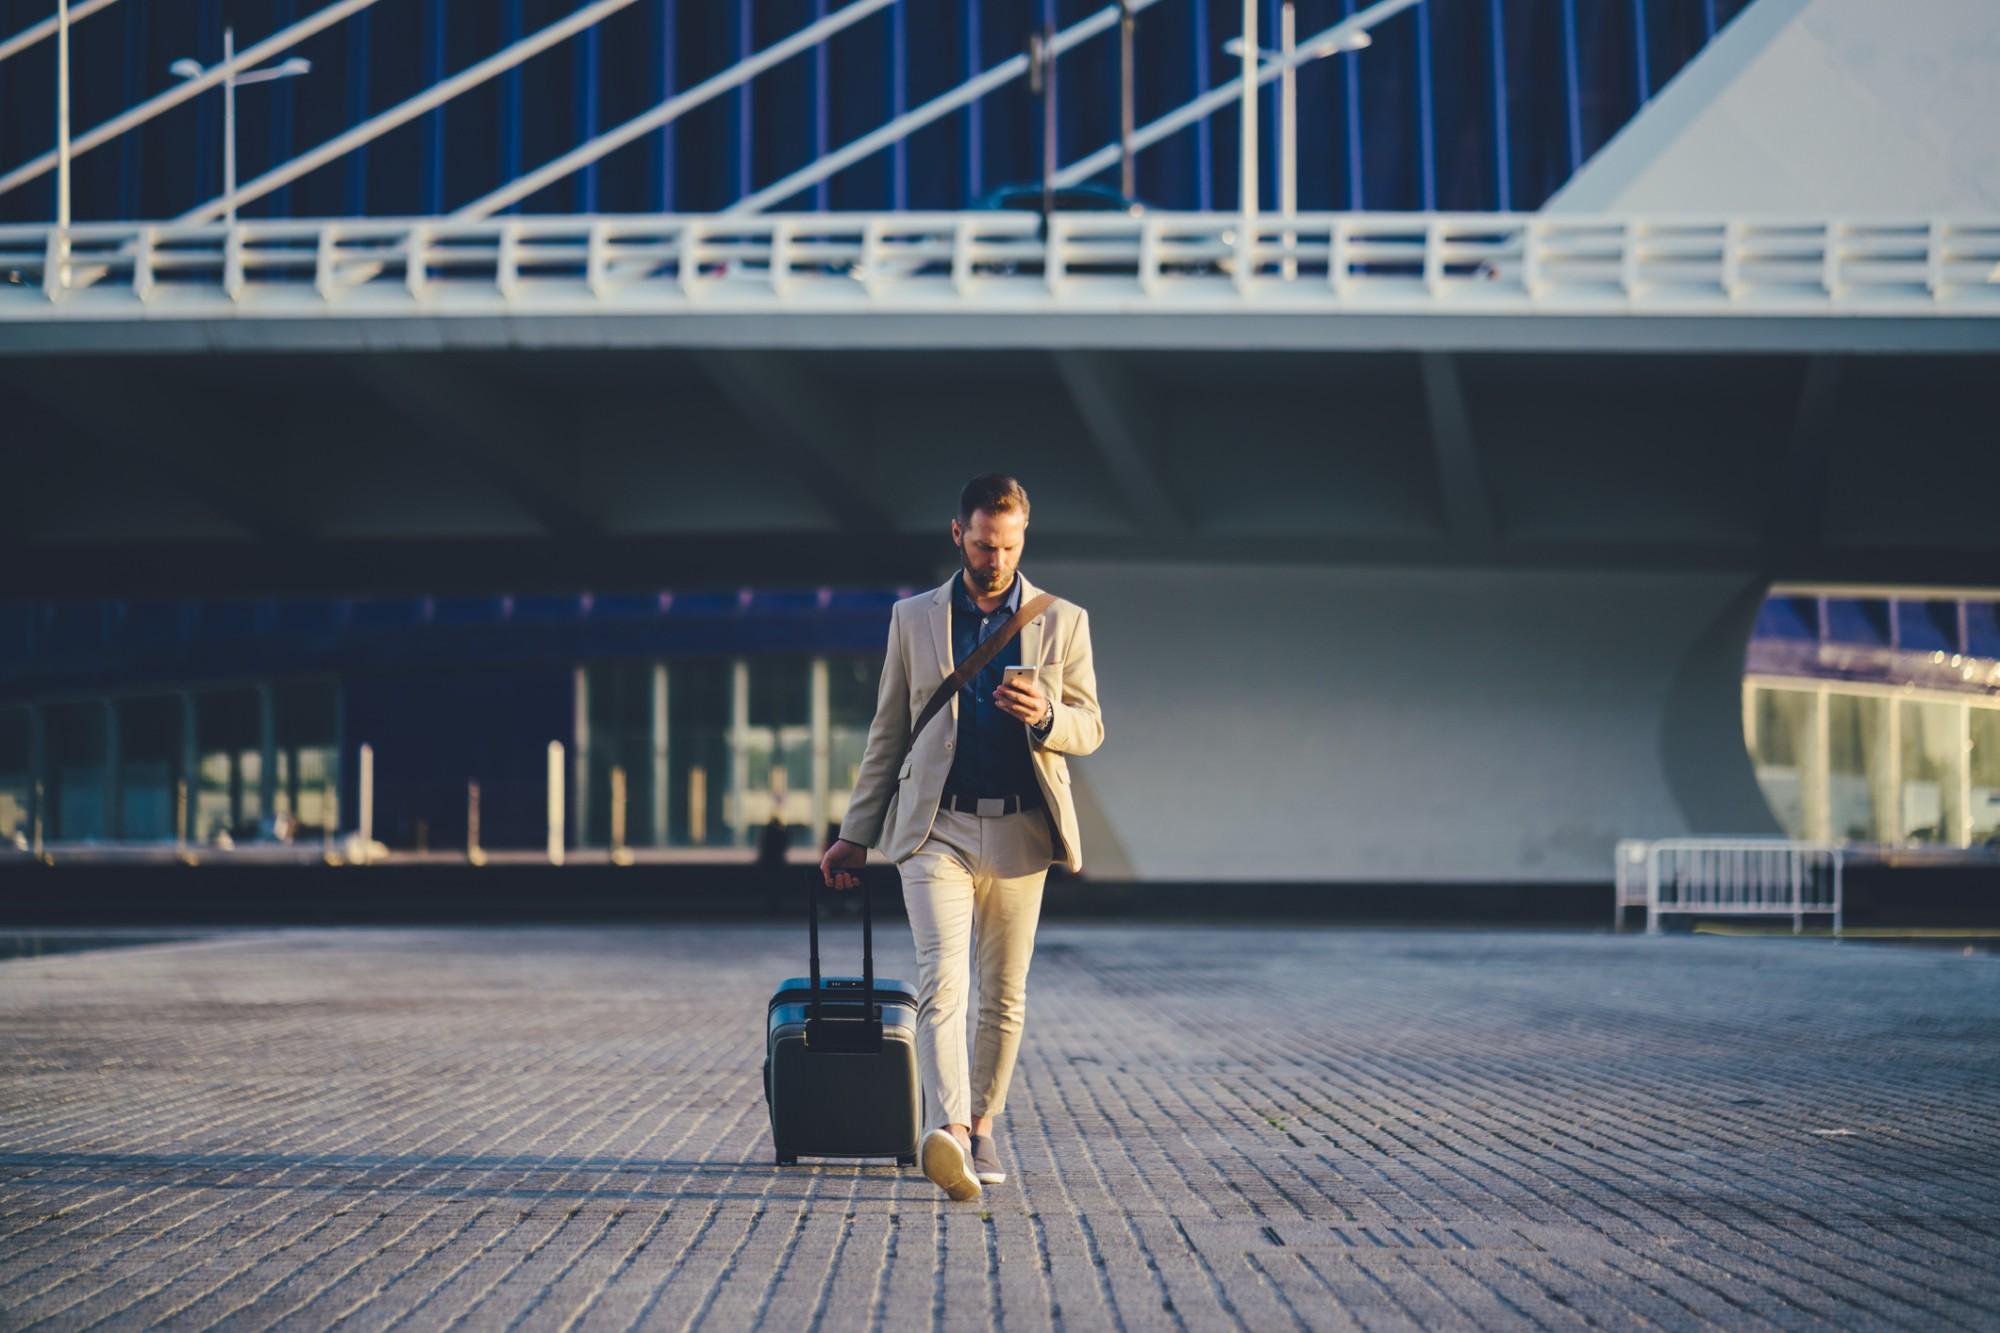 Seguro em viagens - Argo Solutions - Simplifying your journey